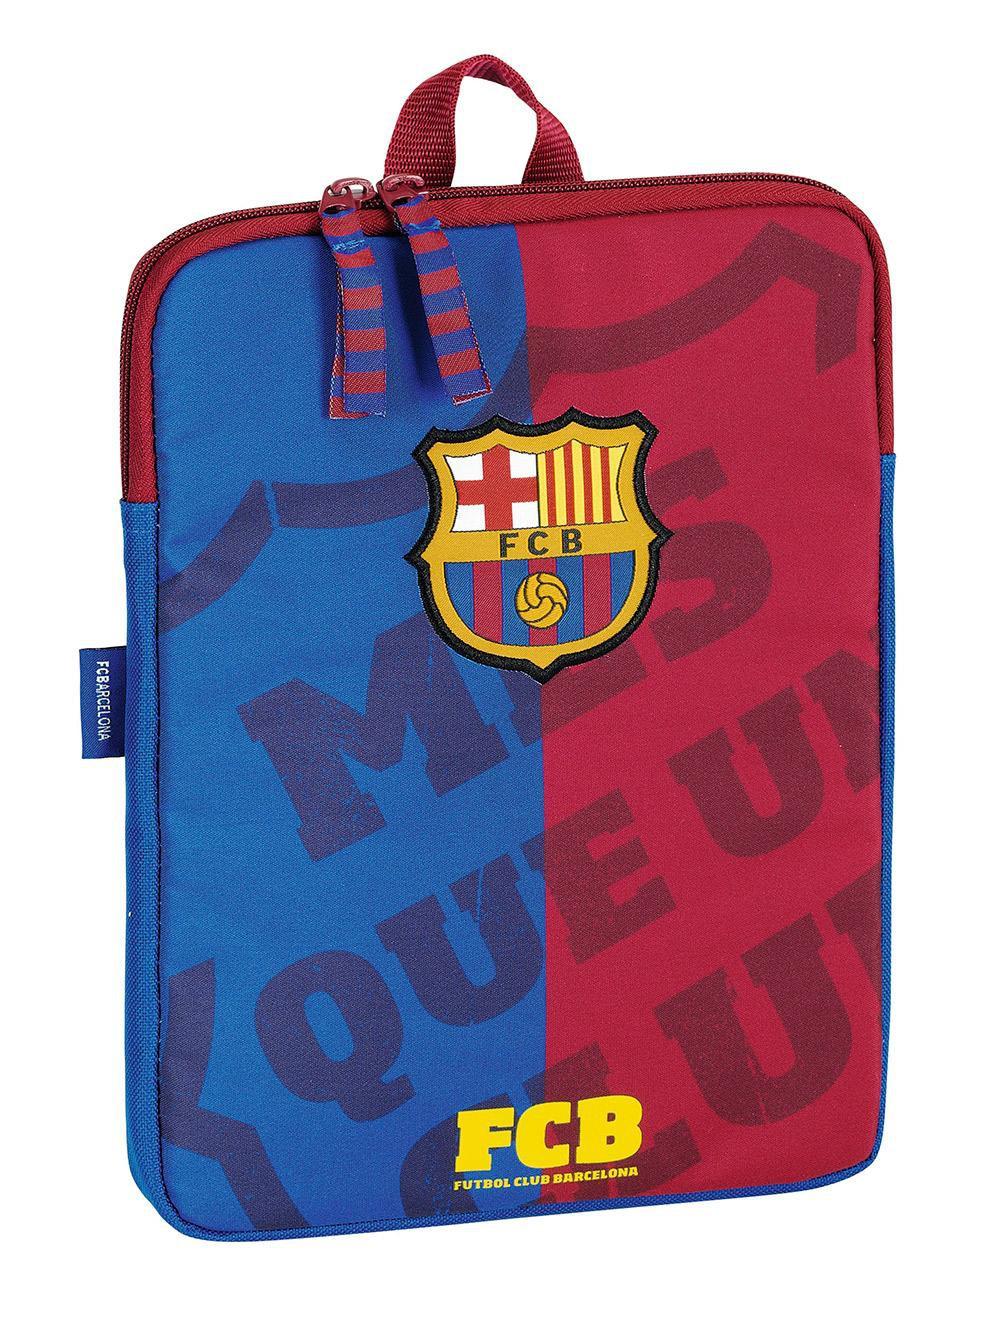 Fc Barcelona Tablet Sleeve Mquc 13/14